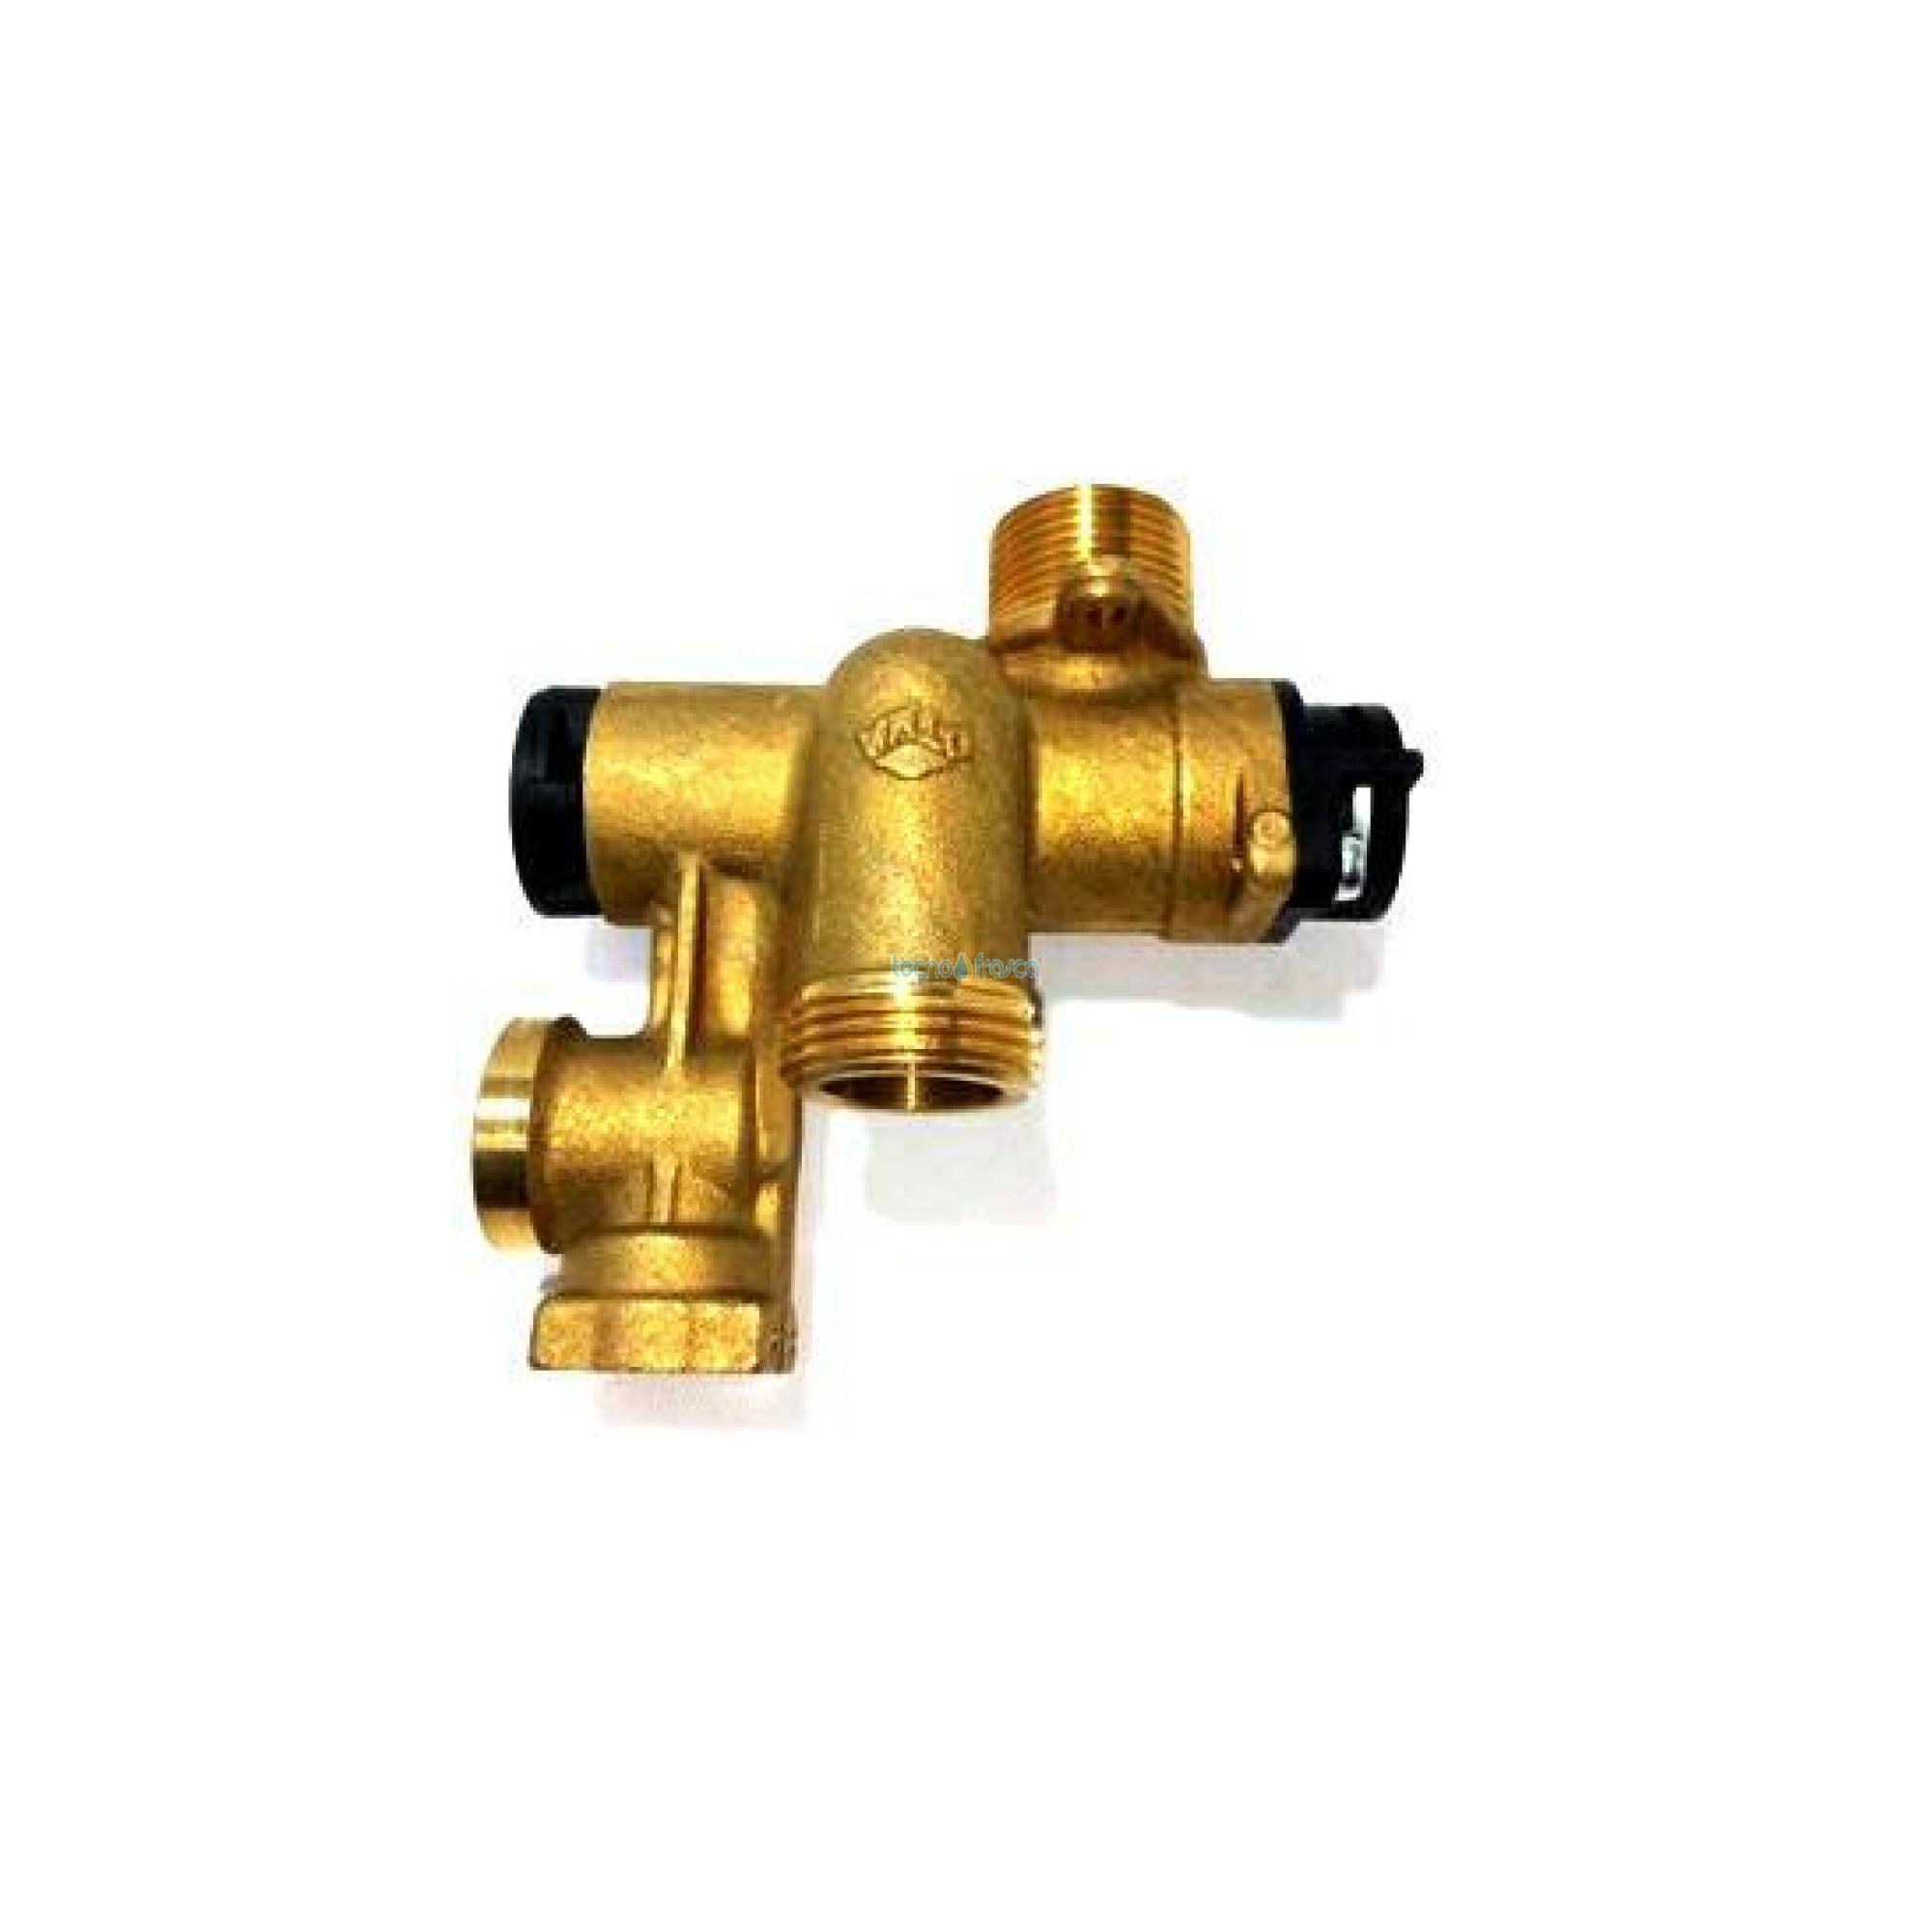 Immergas gruppo 3vie compact block nike/eolo mini 3.016701